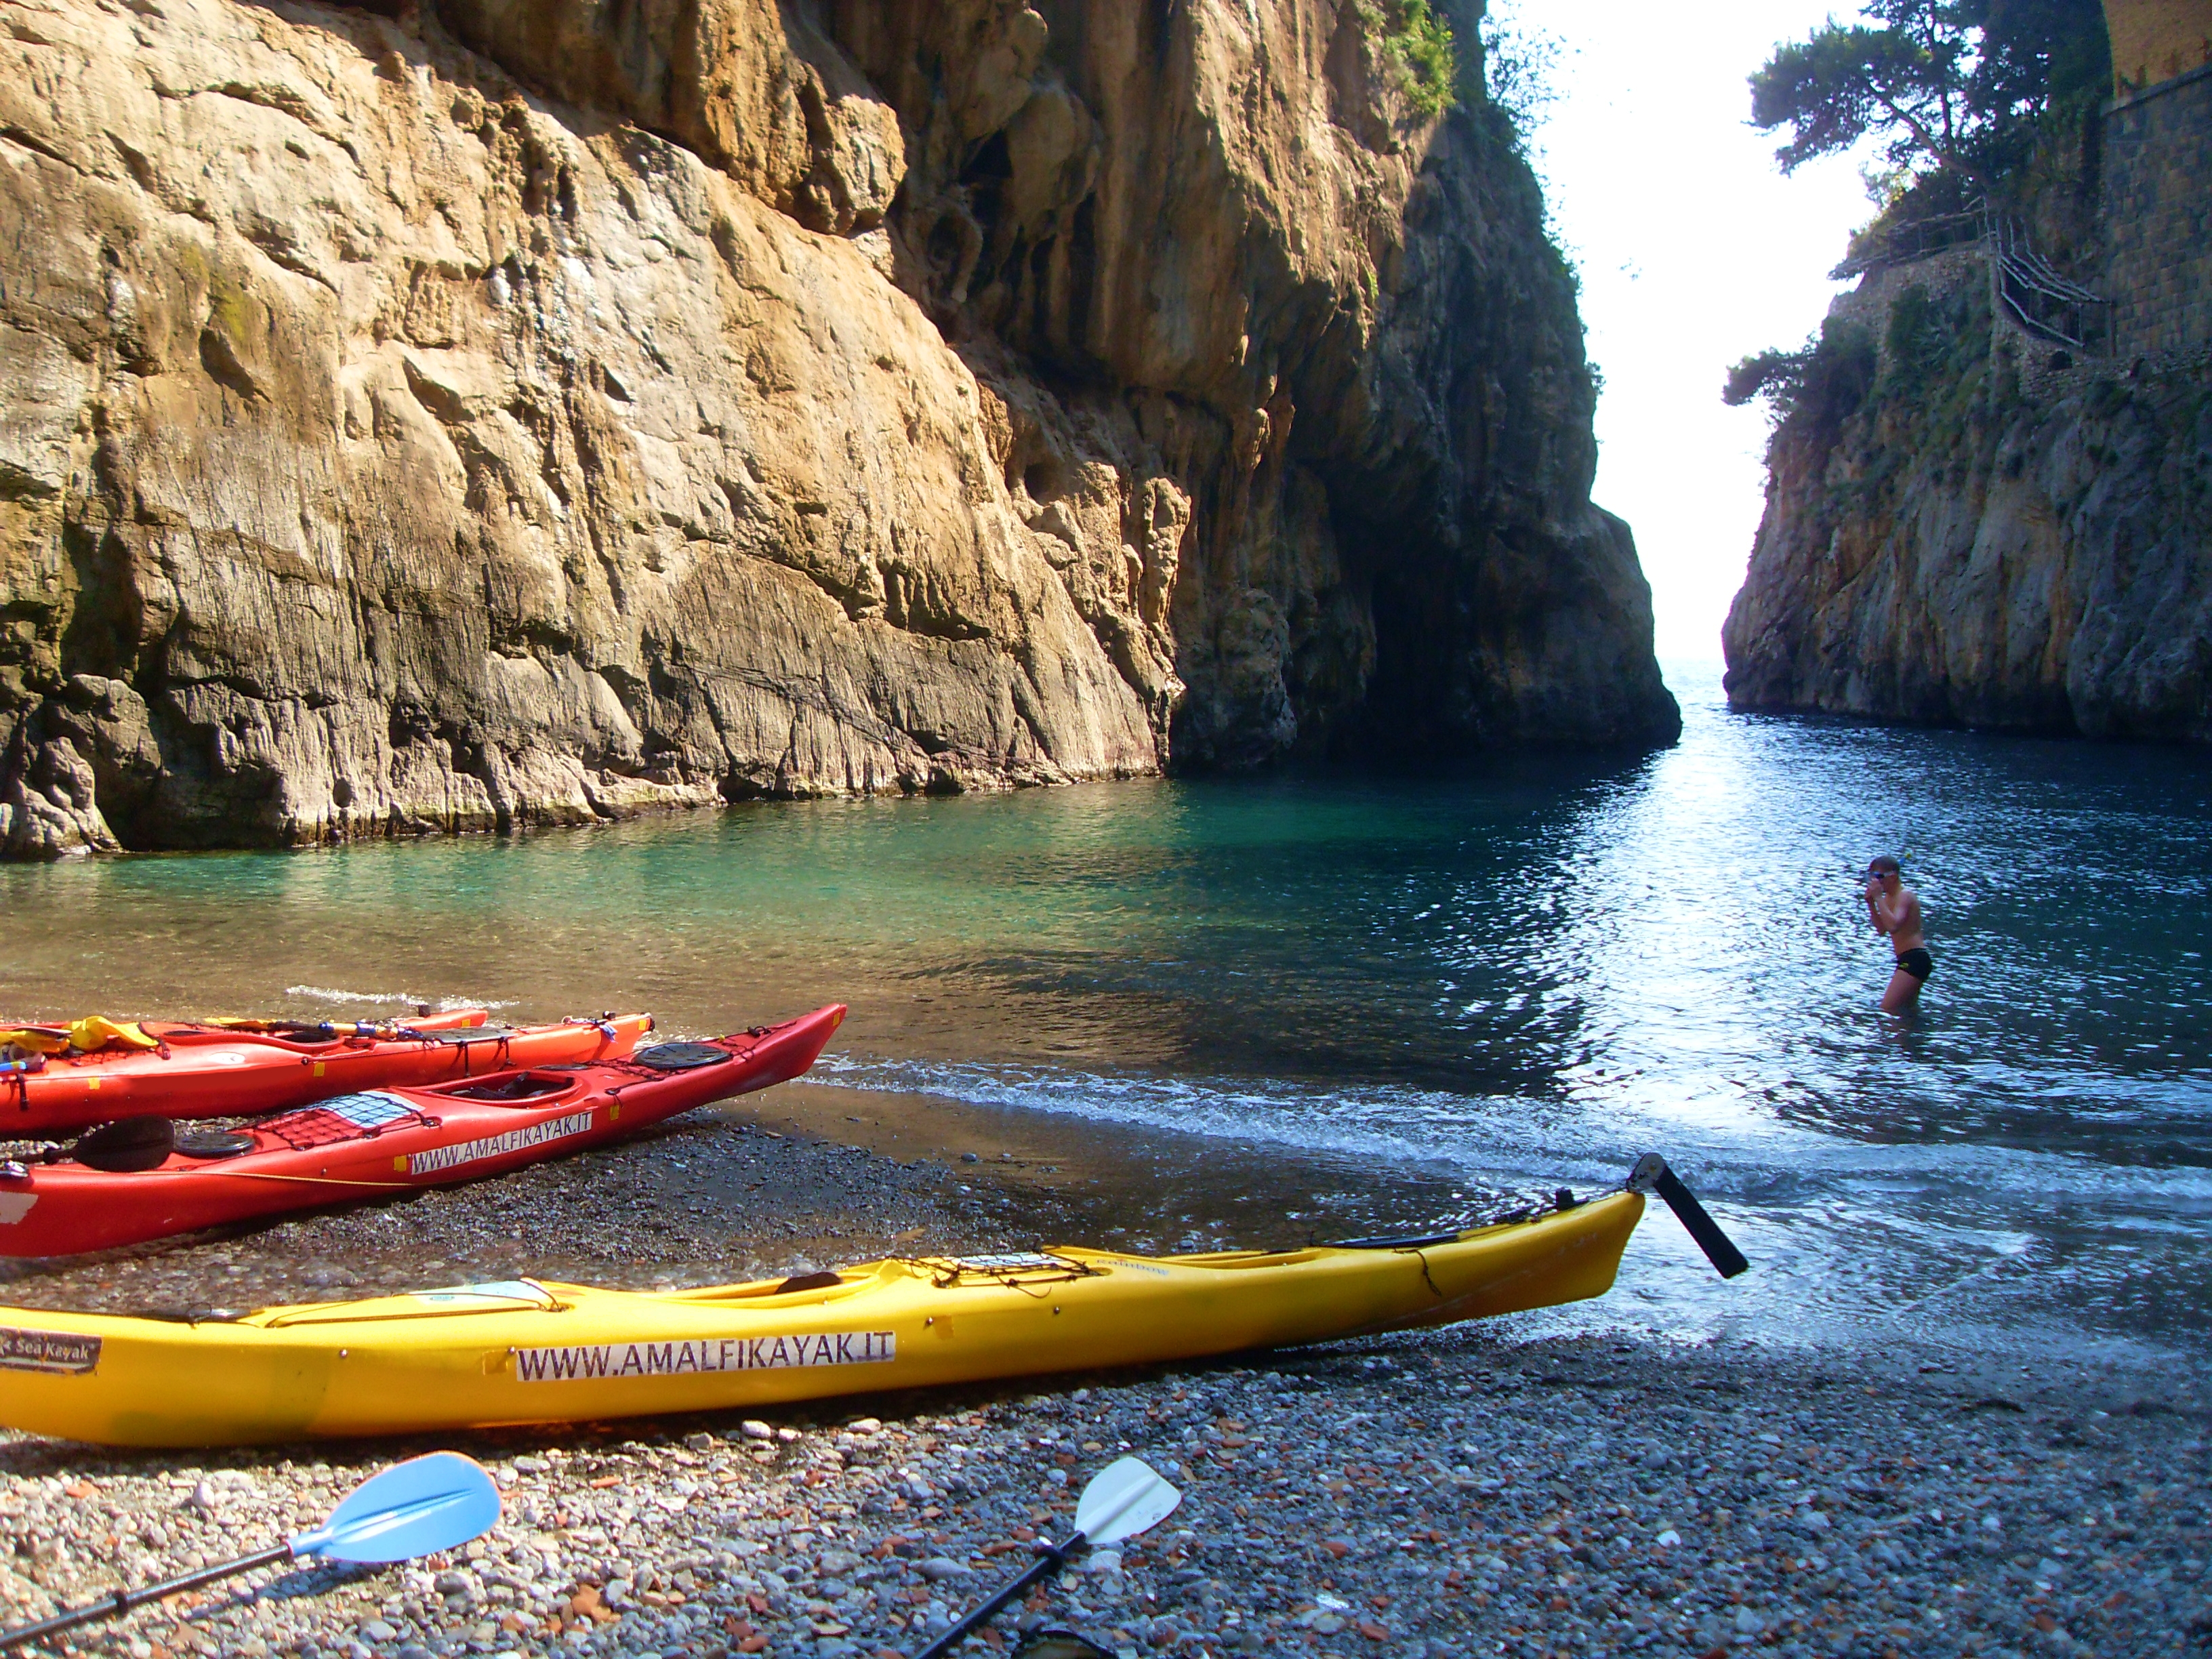 Furore Fjord - Amalfi Kayak, Italy